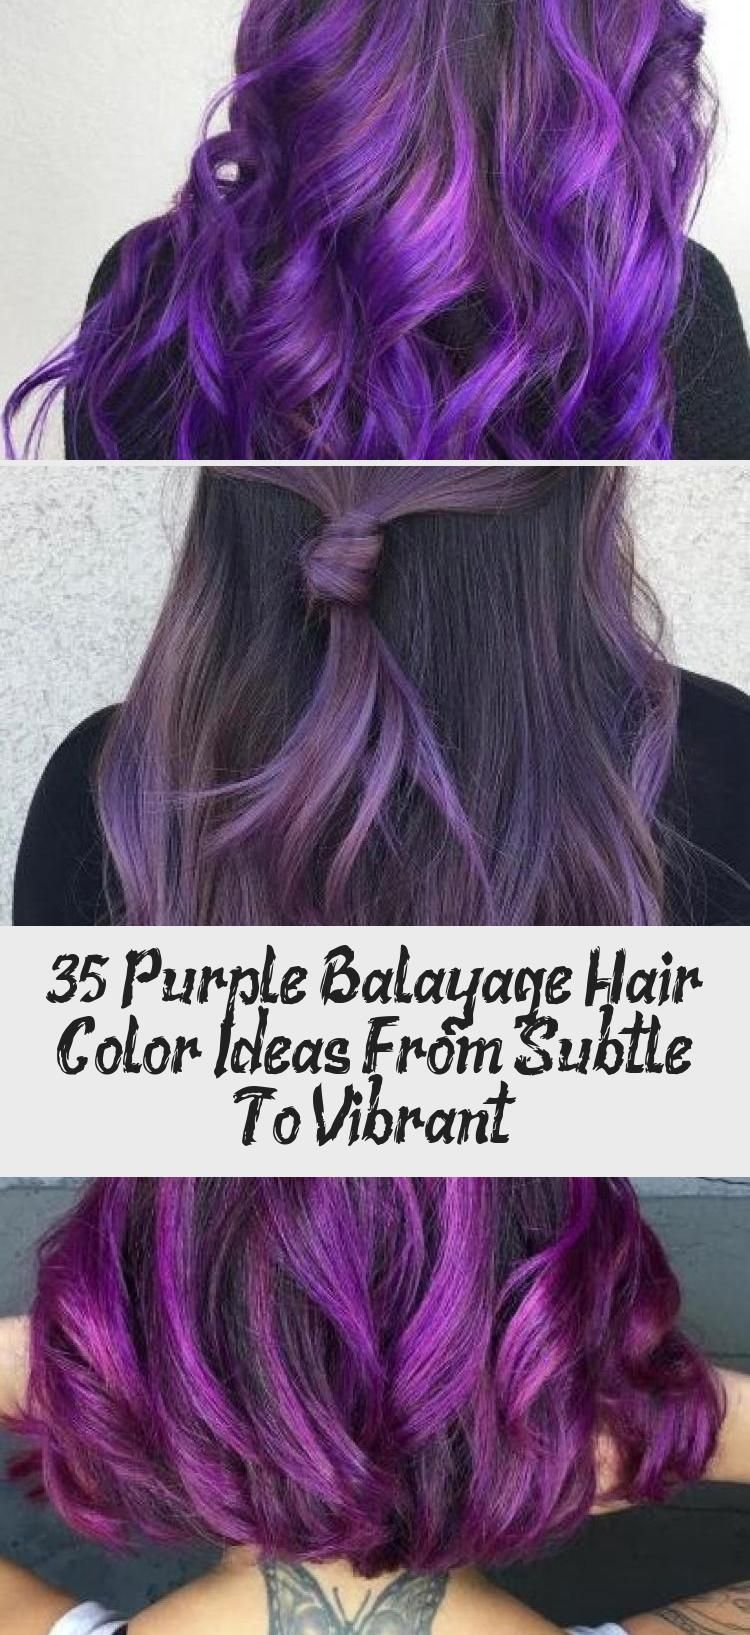 35 lila balayage haarfarbe ideen von subtil bis lebendig